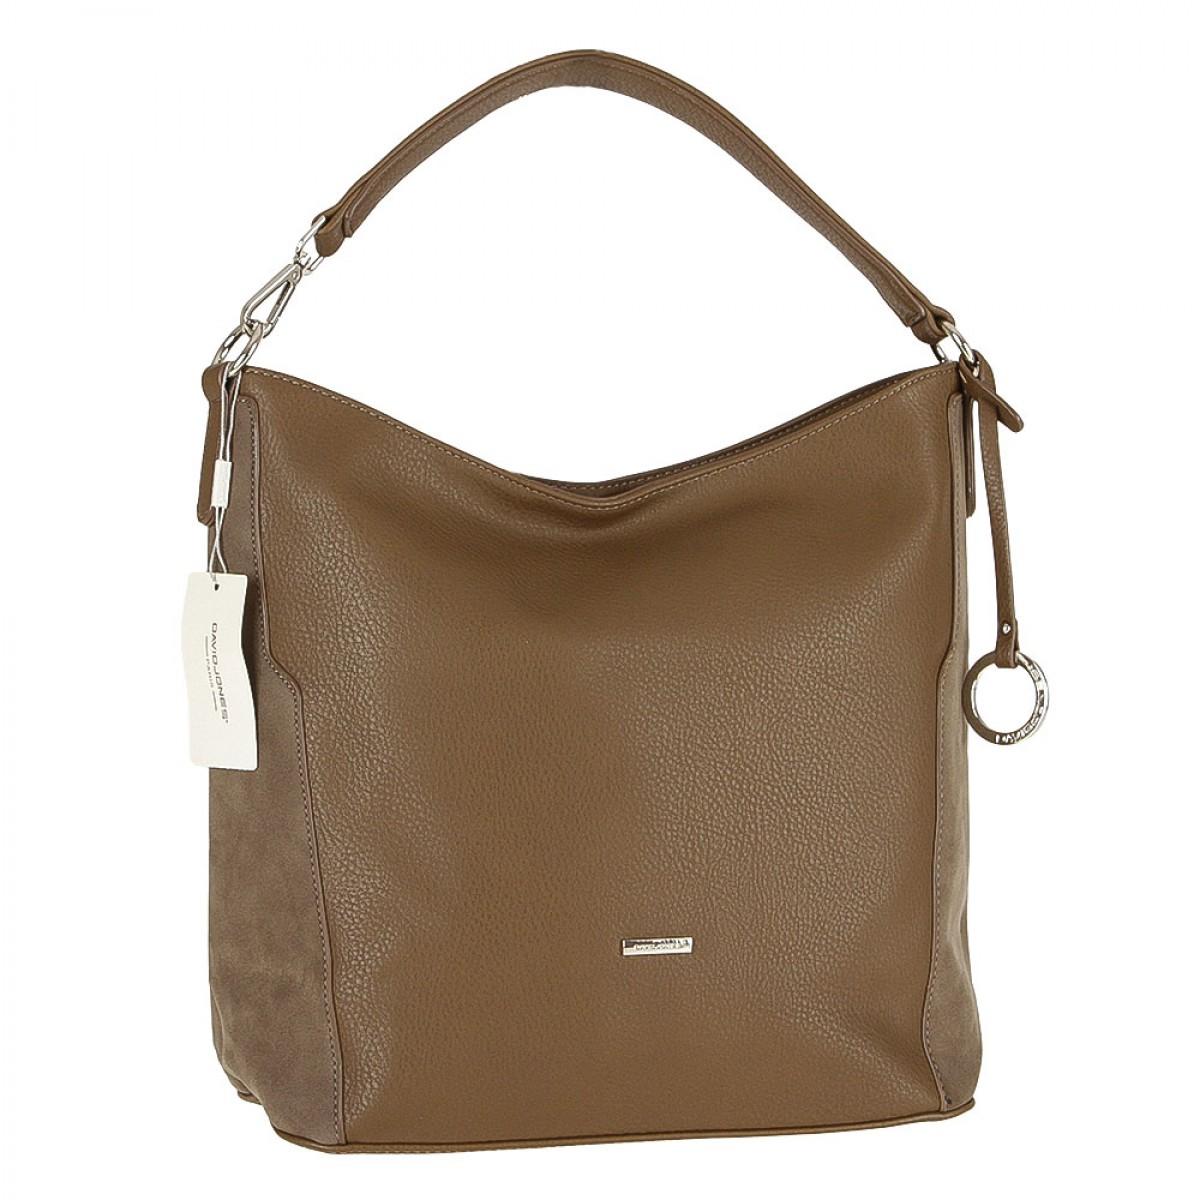 Жіноча сумка David Jones 5606-1 D.CAMEL